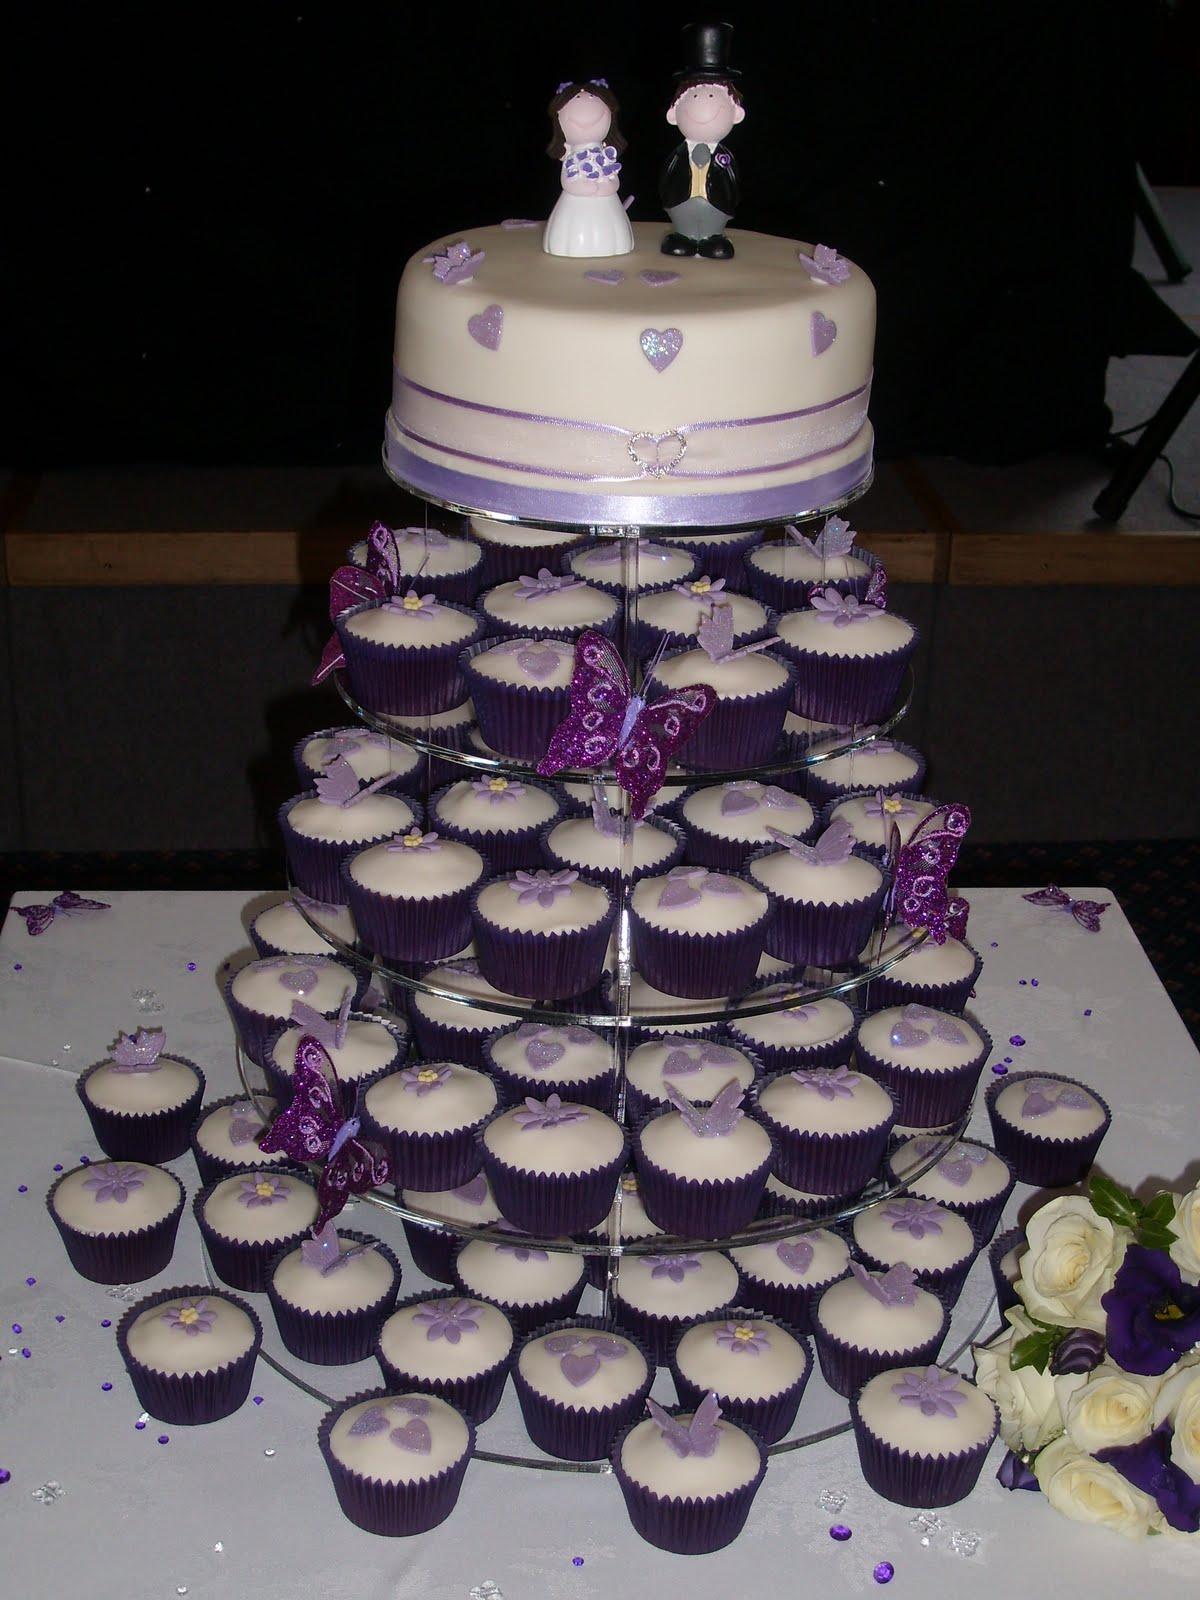 Noot S Blog Cupcakes Wedding Cake Palm